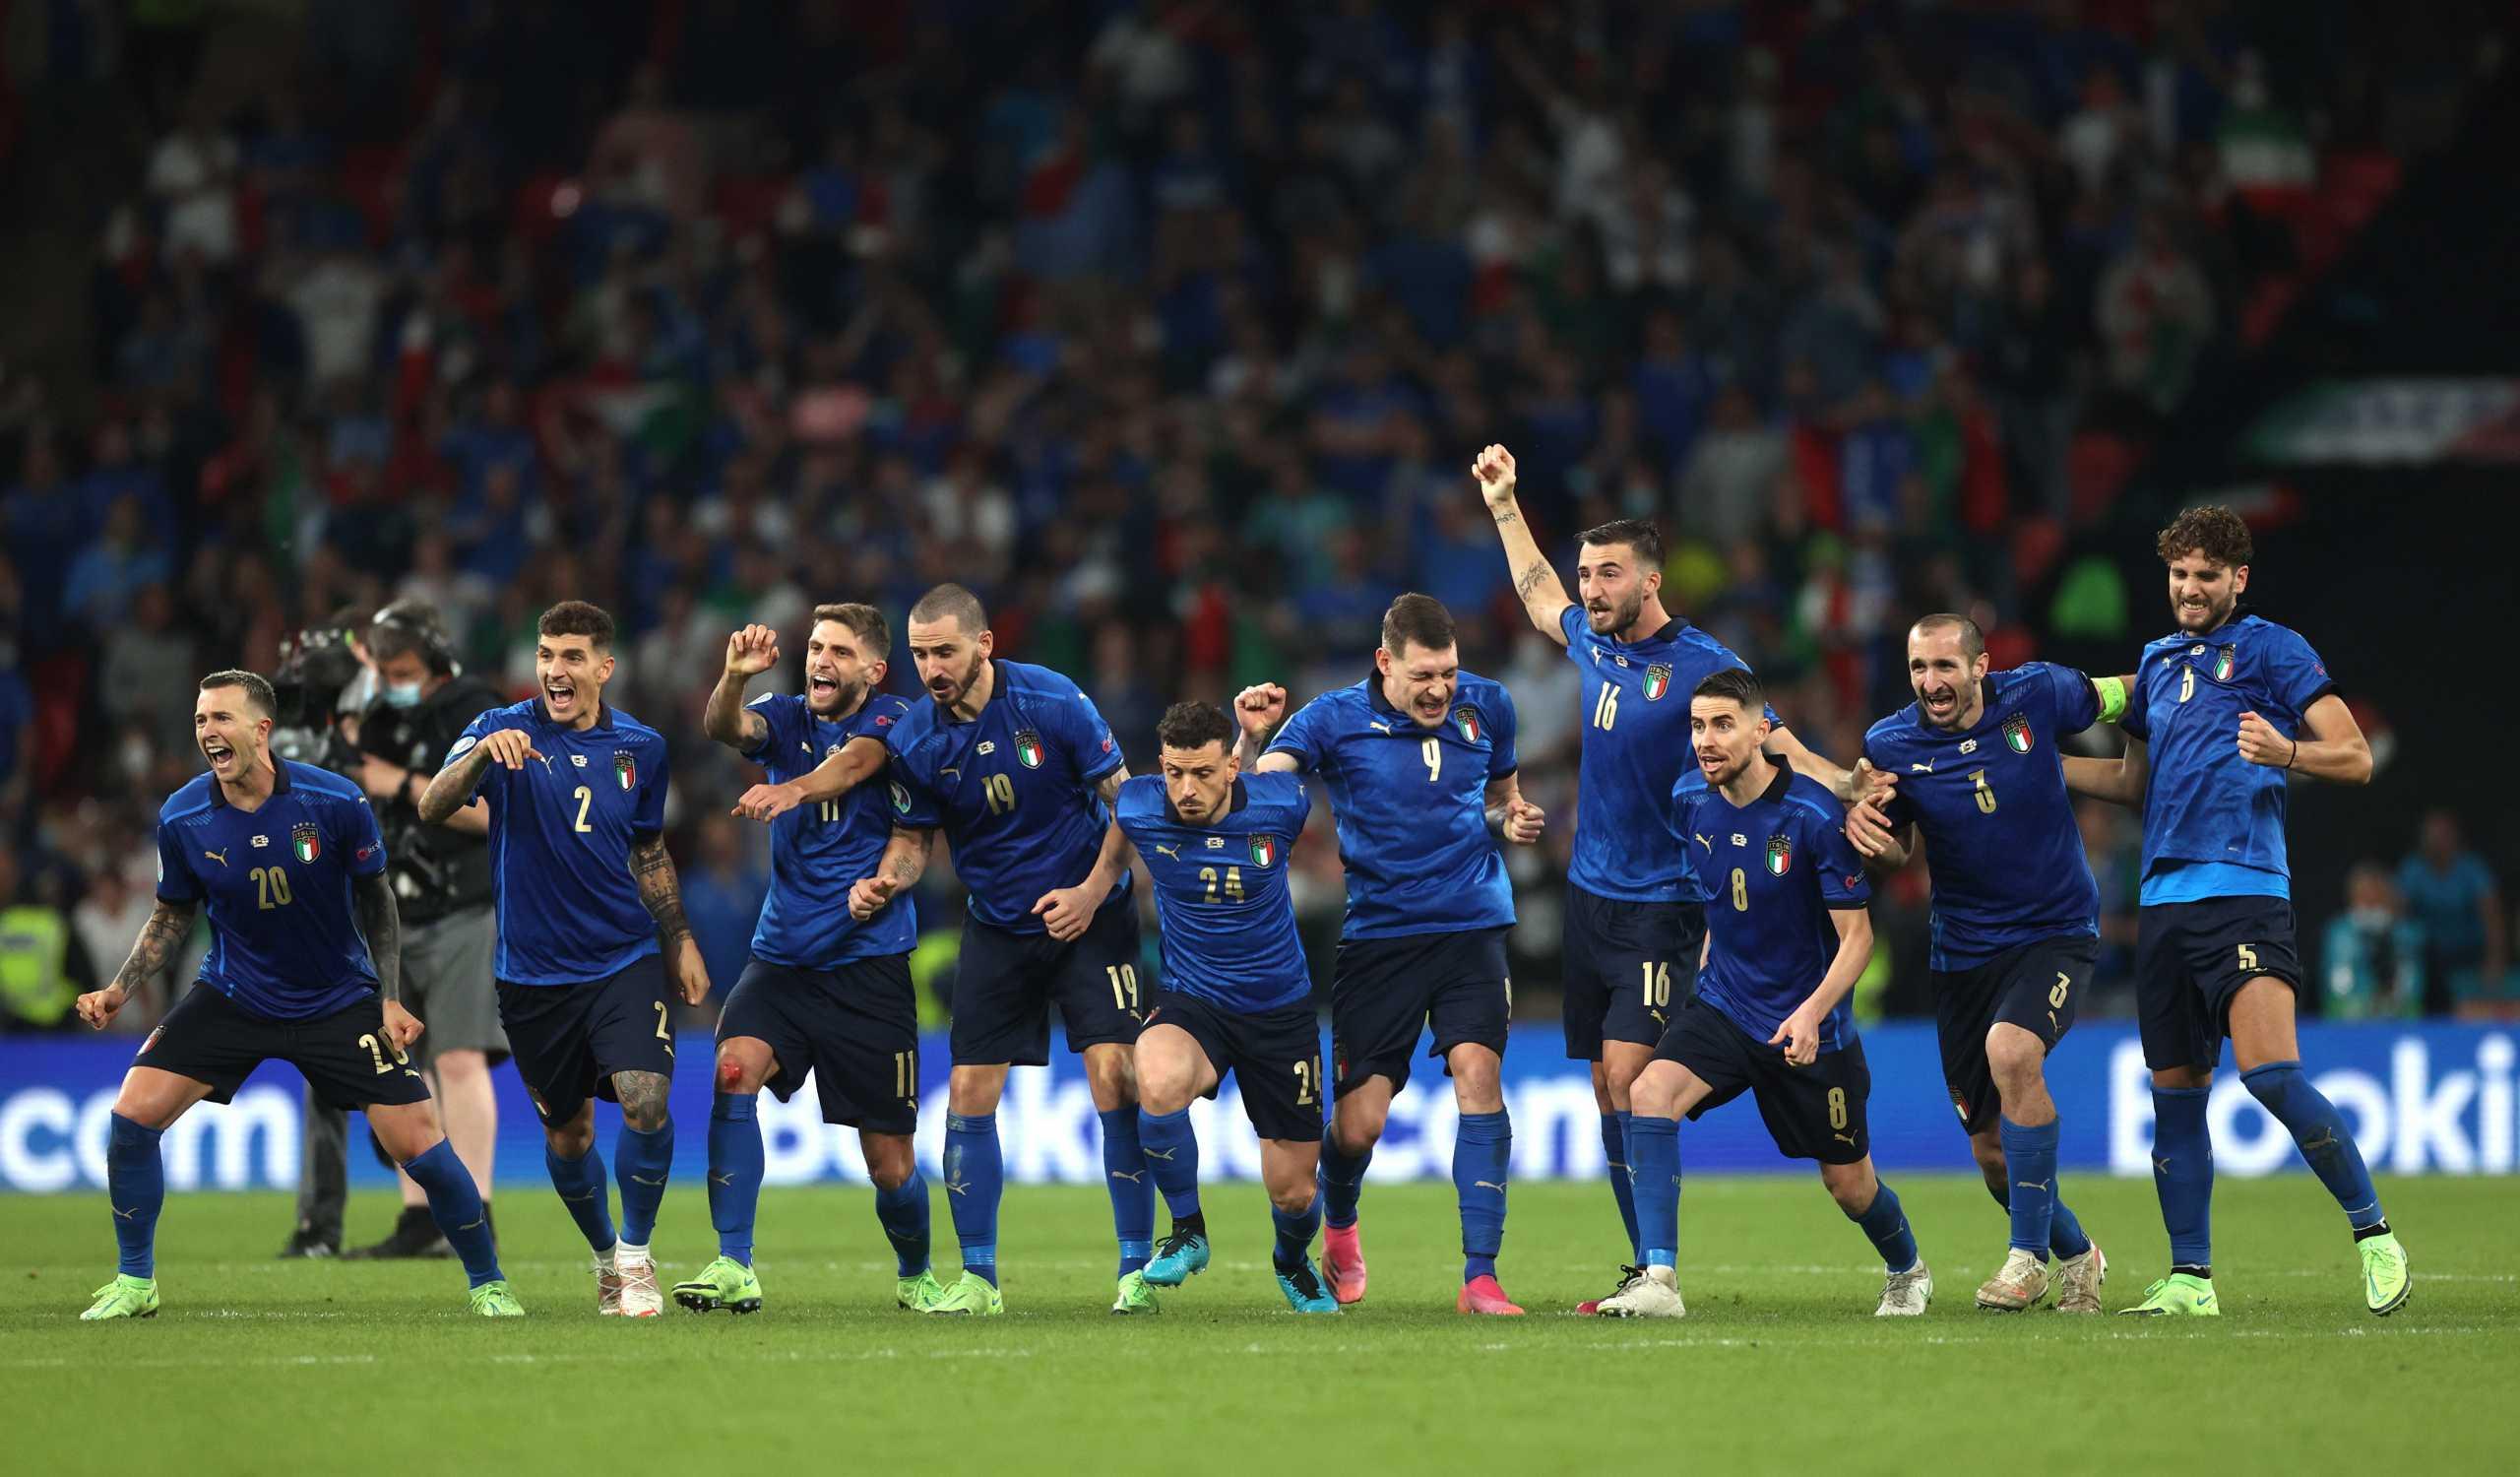 Euro 2020, Ιταλία – Αγγλία: Οι Ιταλοί «χάλασαν» το αγγλικό πάρτι και αναδείχθηκαν πρωταθλητές Ευρώπης